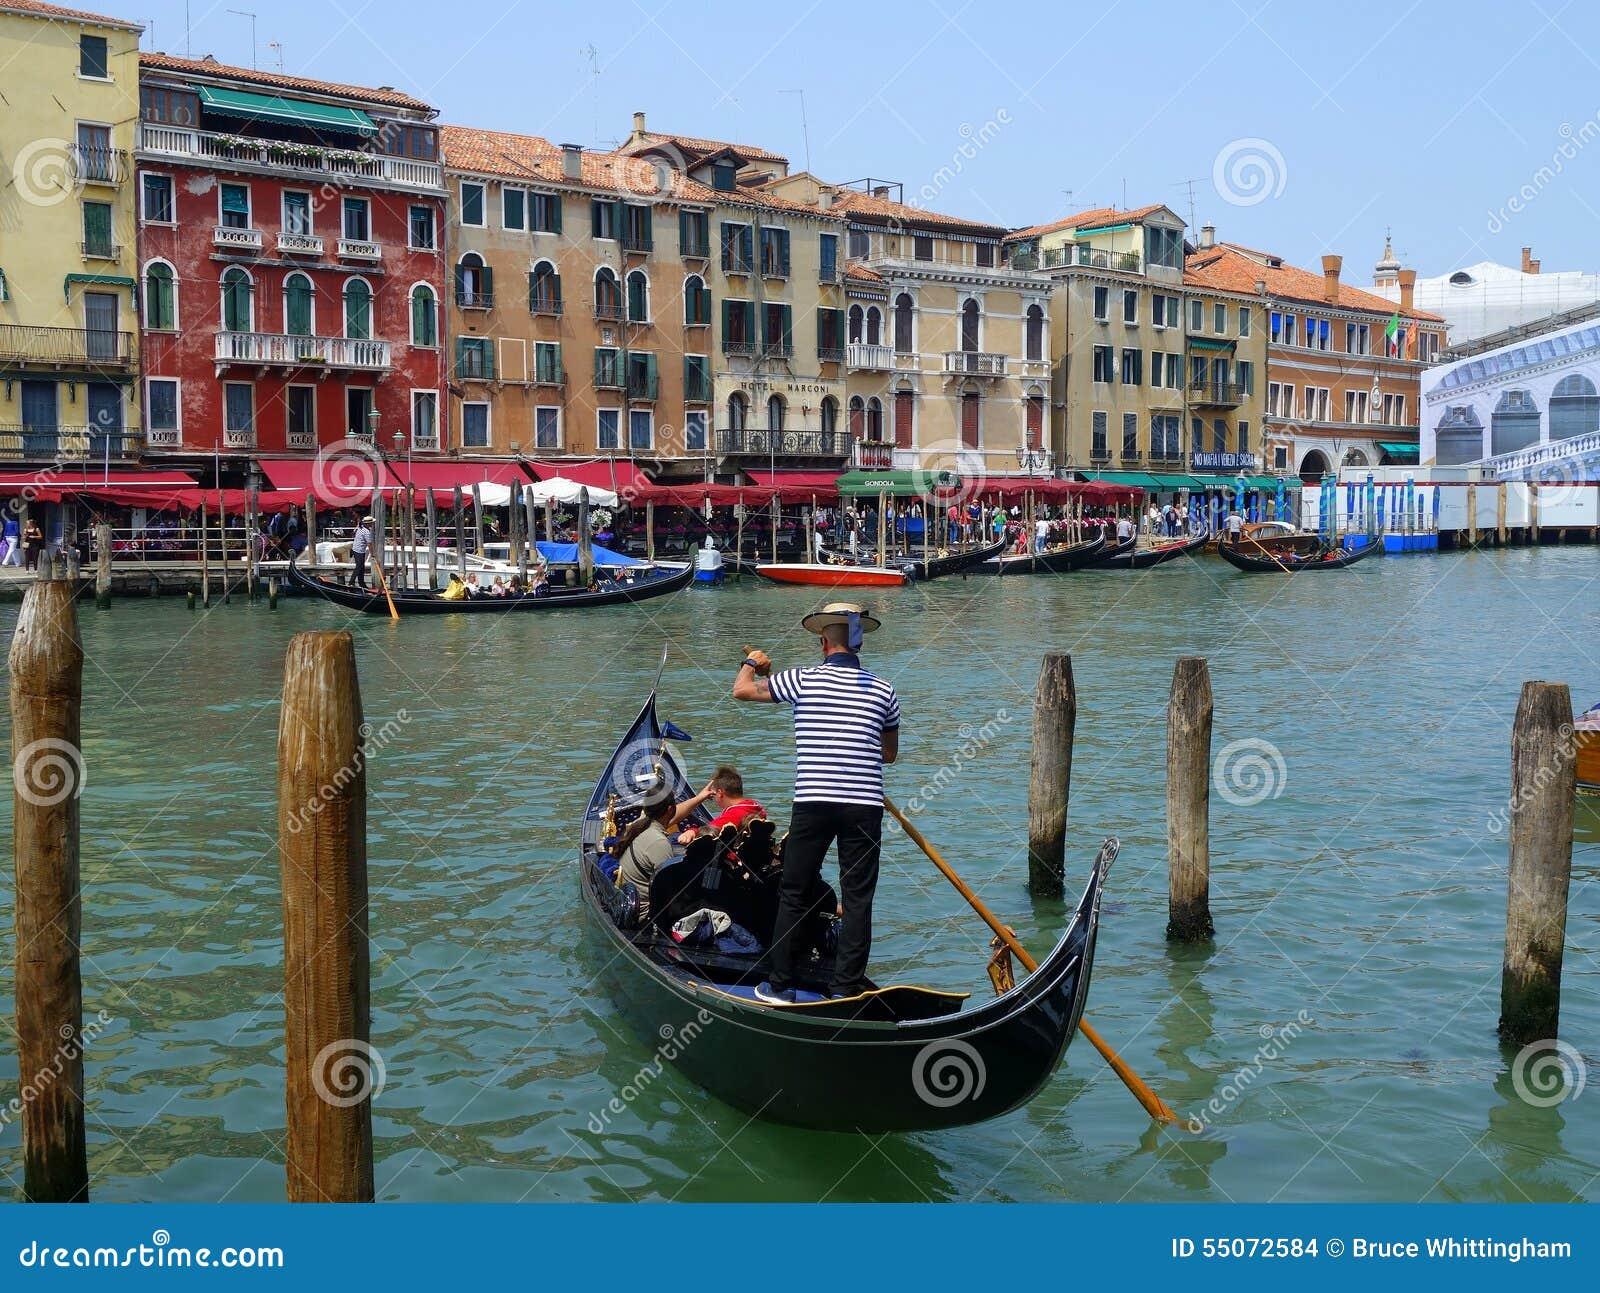 Best Hotels In Venice Grand Canal